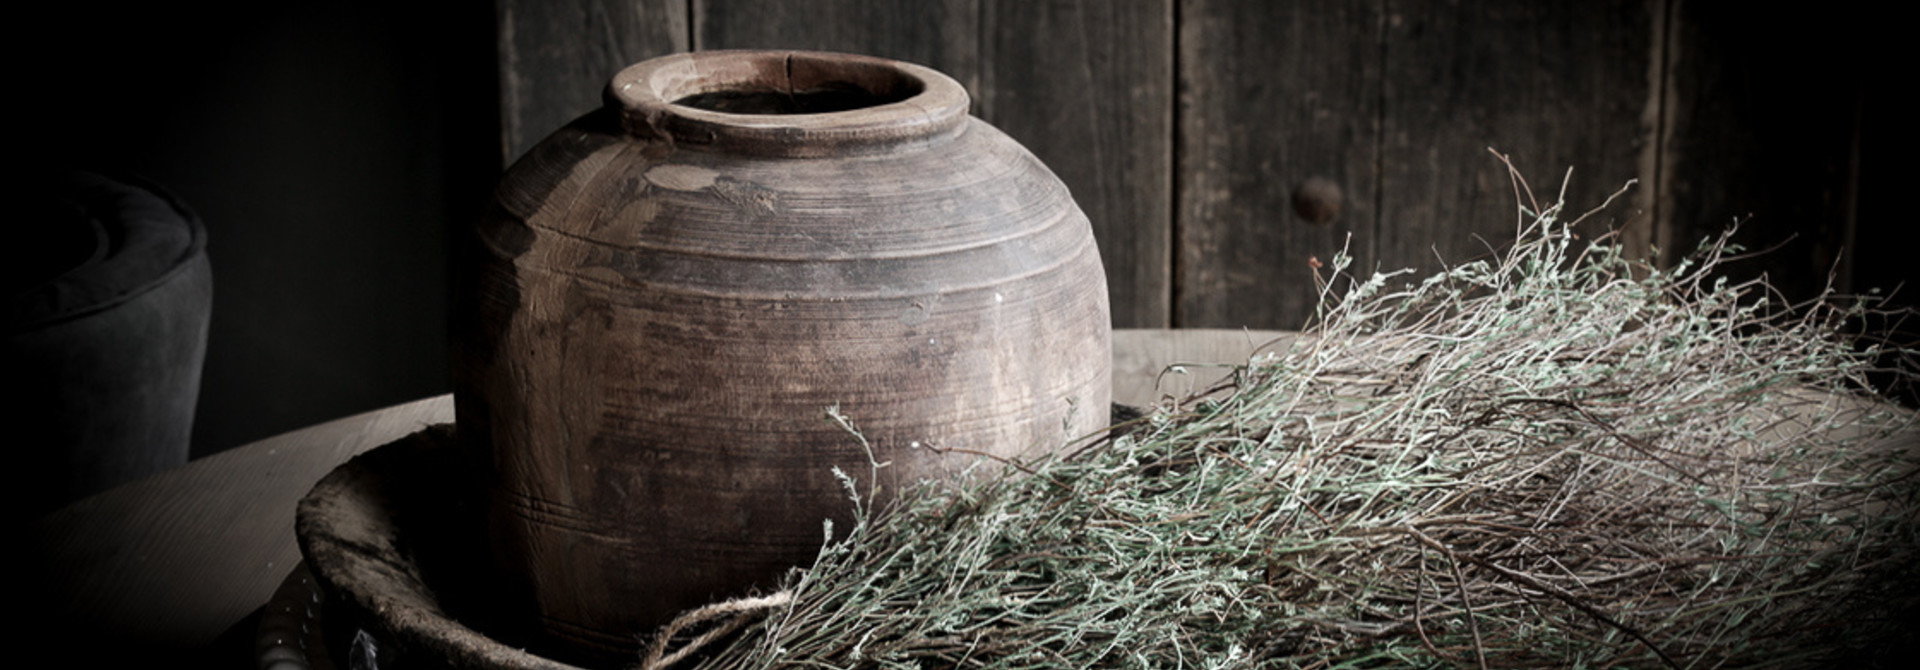 Nepalese wooden jugs